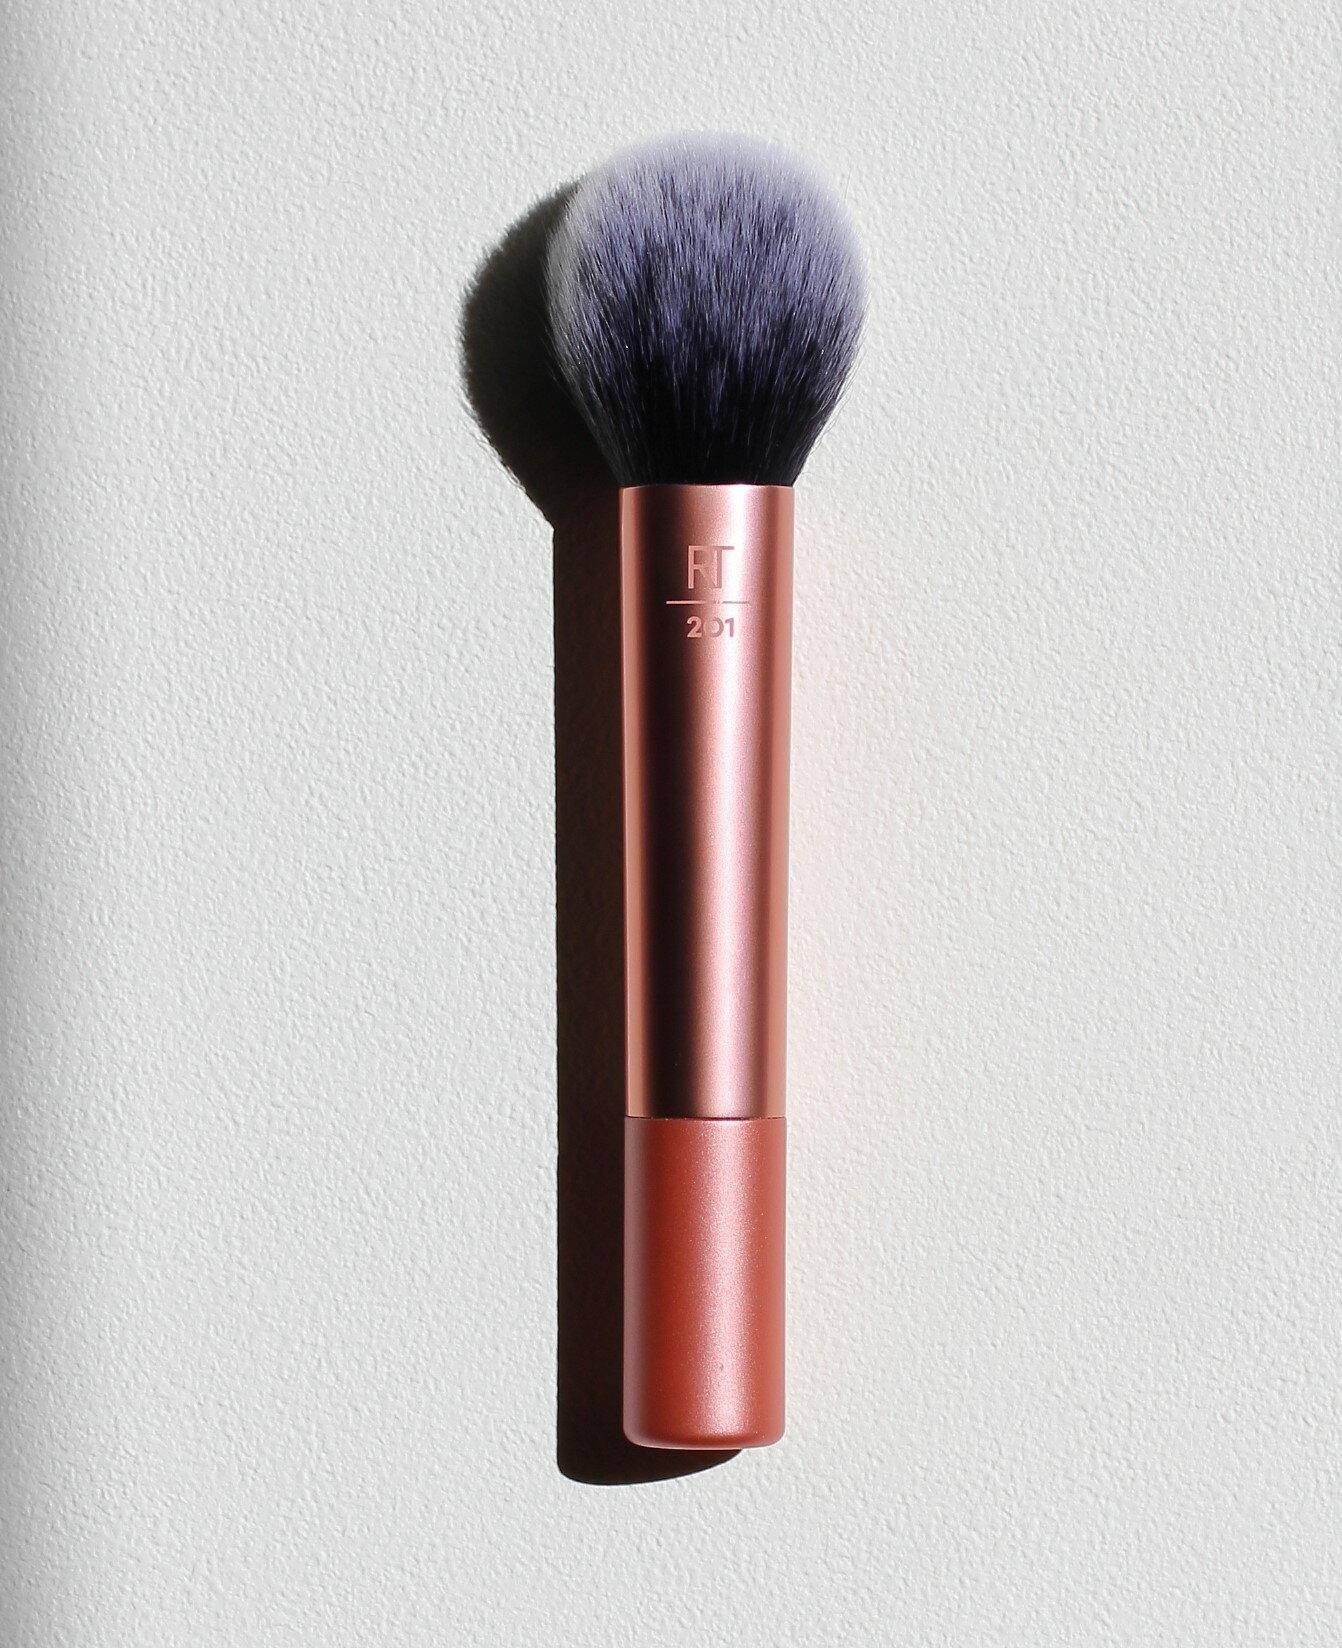 網紅Real techniques/#1401蜜粉刷~單支裝-Powder Brush 腮紅刷 修容刷 眼影刷